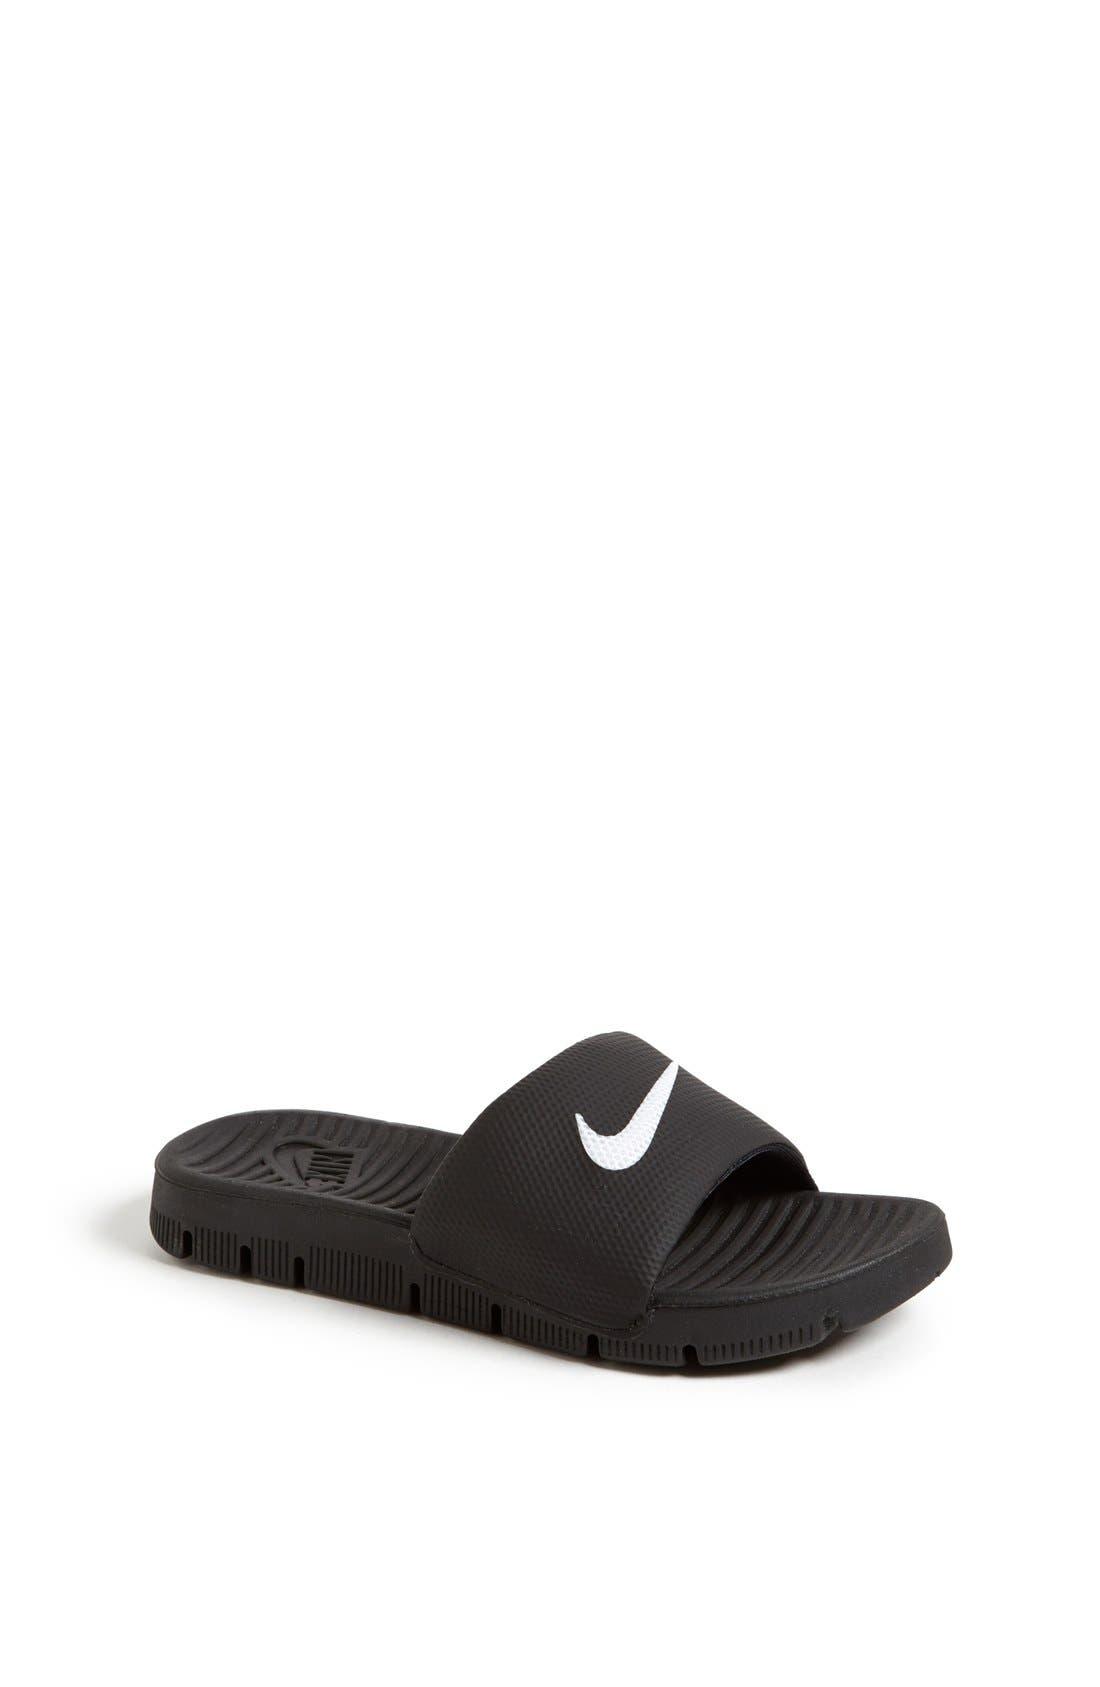 Alternate Image 1 Selected - Nike 'Flex Motion' Sandal (Little Kid & Big Kid)